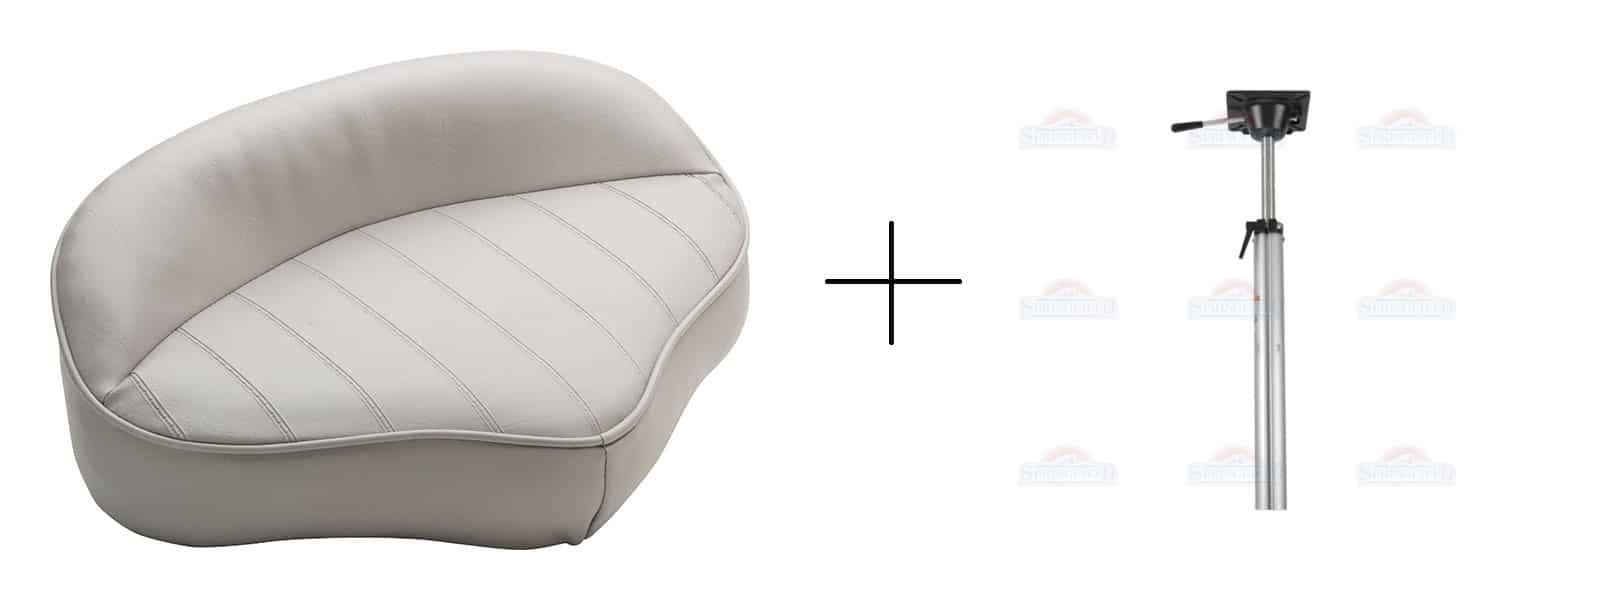 ståstol procasting seat luftdämpad piedestal